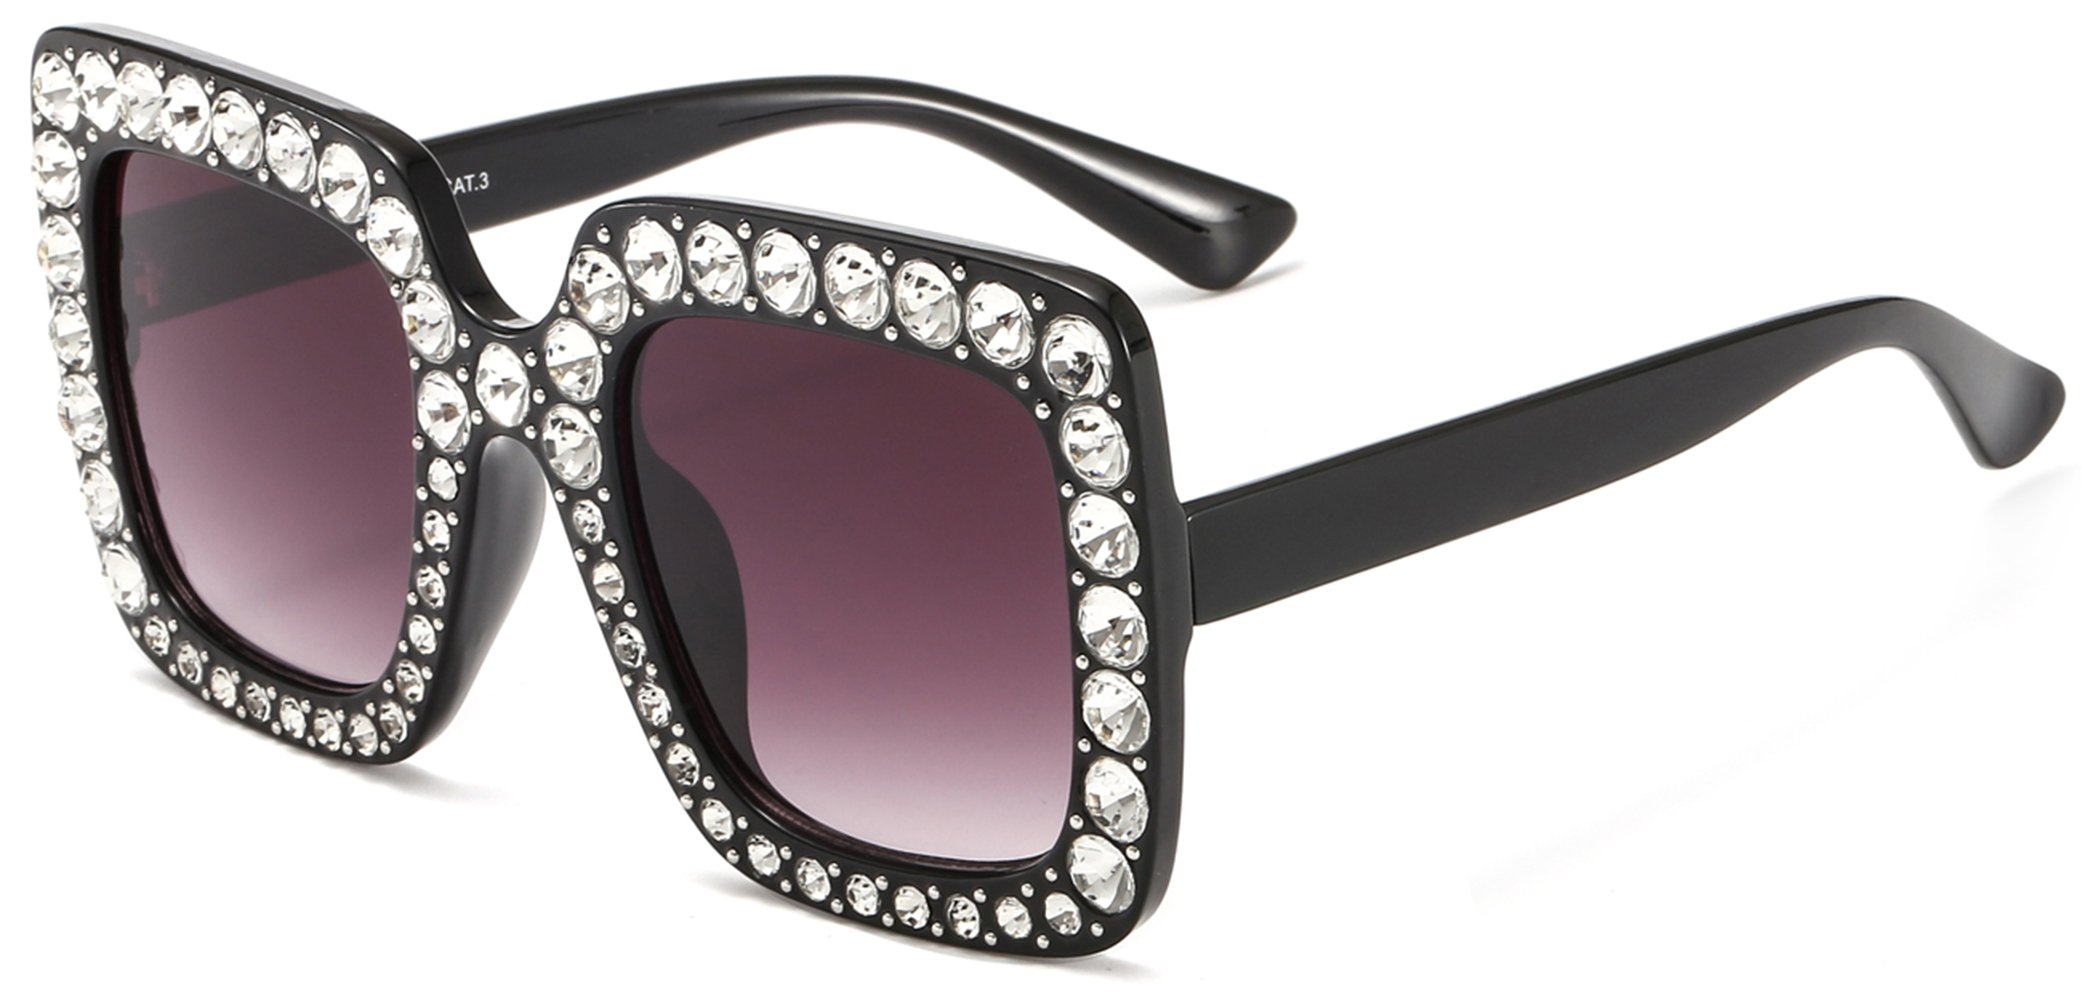 67616f87857 NEW Gucci GG0434S 001 Black Square Frame Grey Sunglasses Authentic.   255.00. MAOLEN Square Oversized Gradient Shades Crystal Sunglasses for  Women(square ...